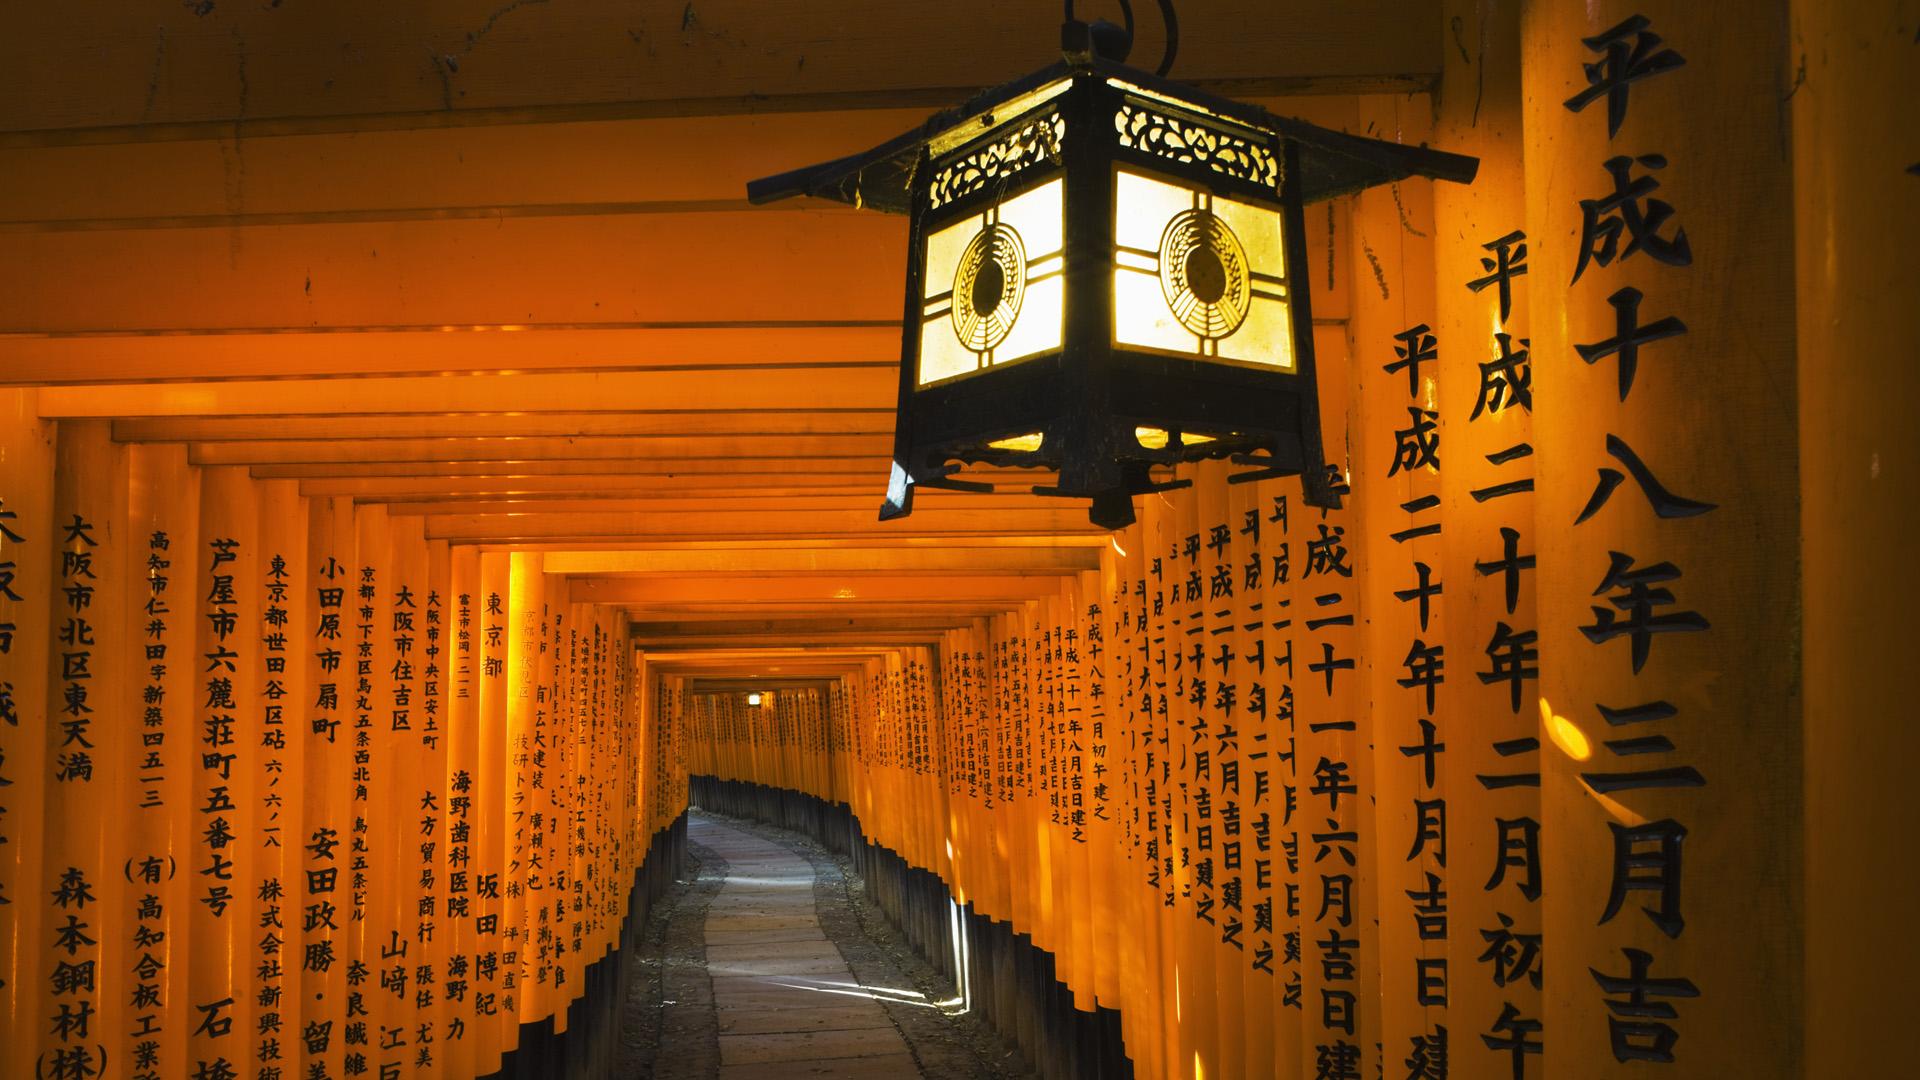 Fushimi Inari Taisha Shrine Kyoto Japan HD Wallpaper 1920x1080